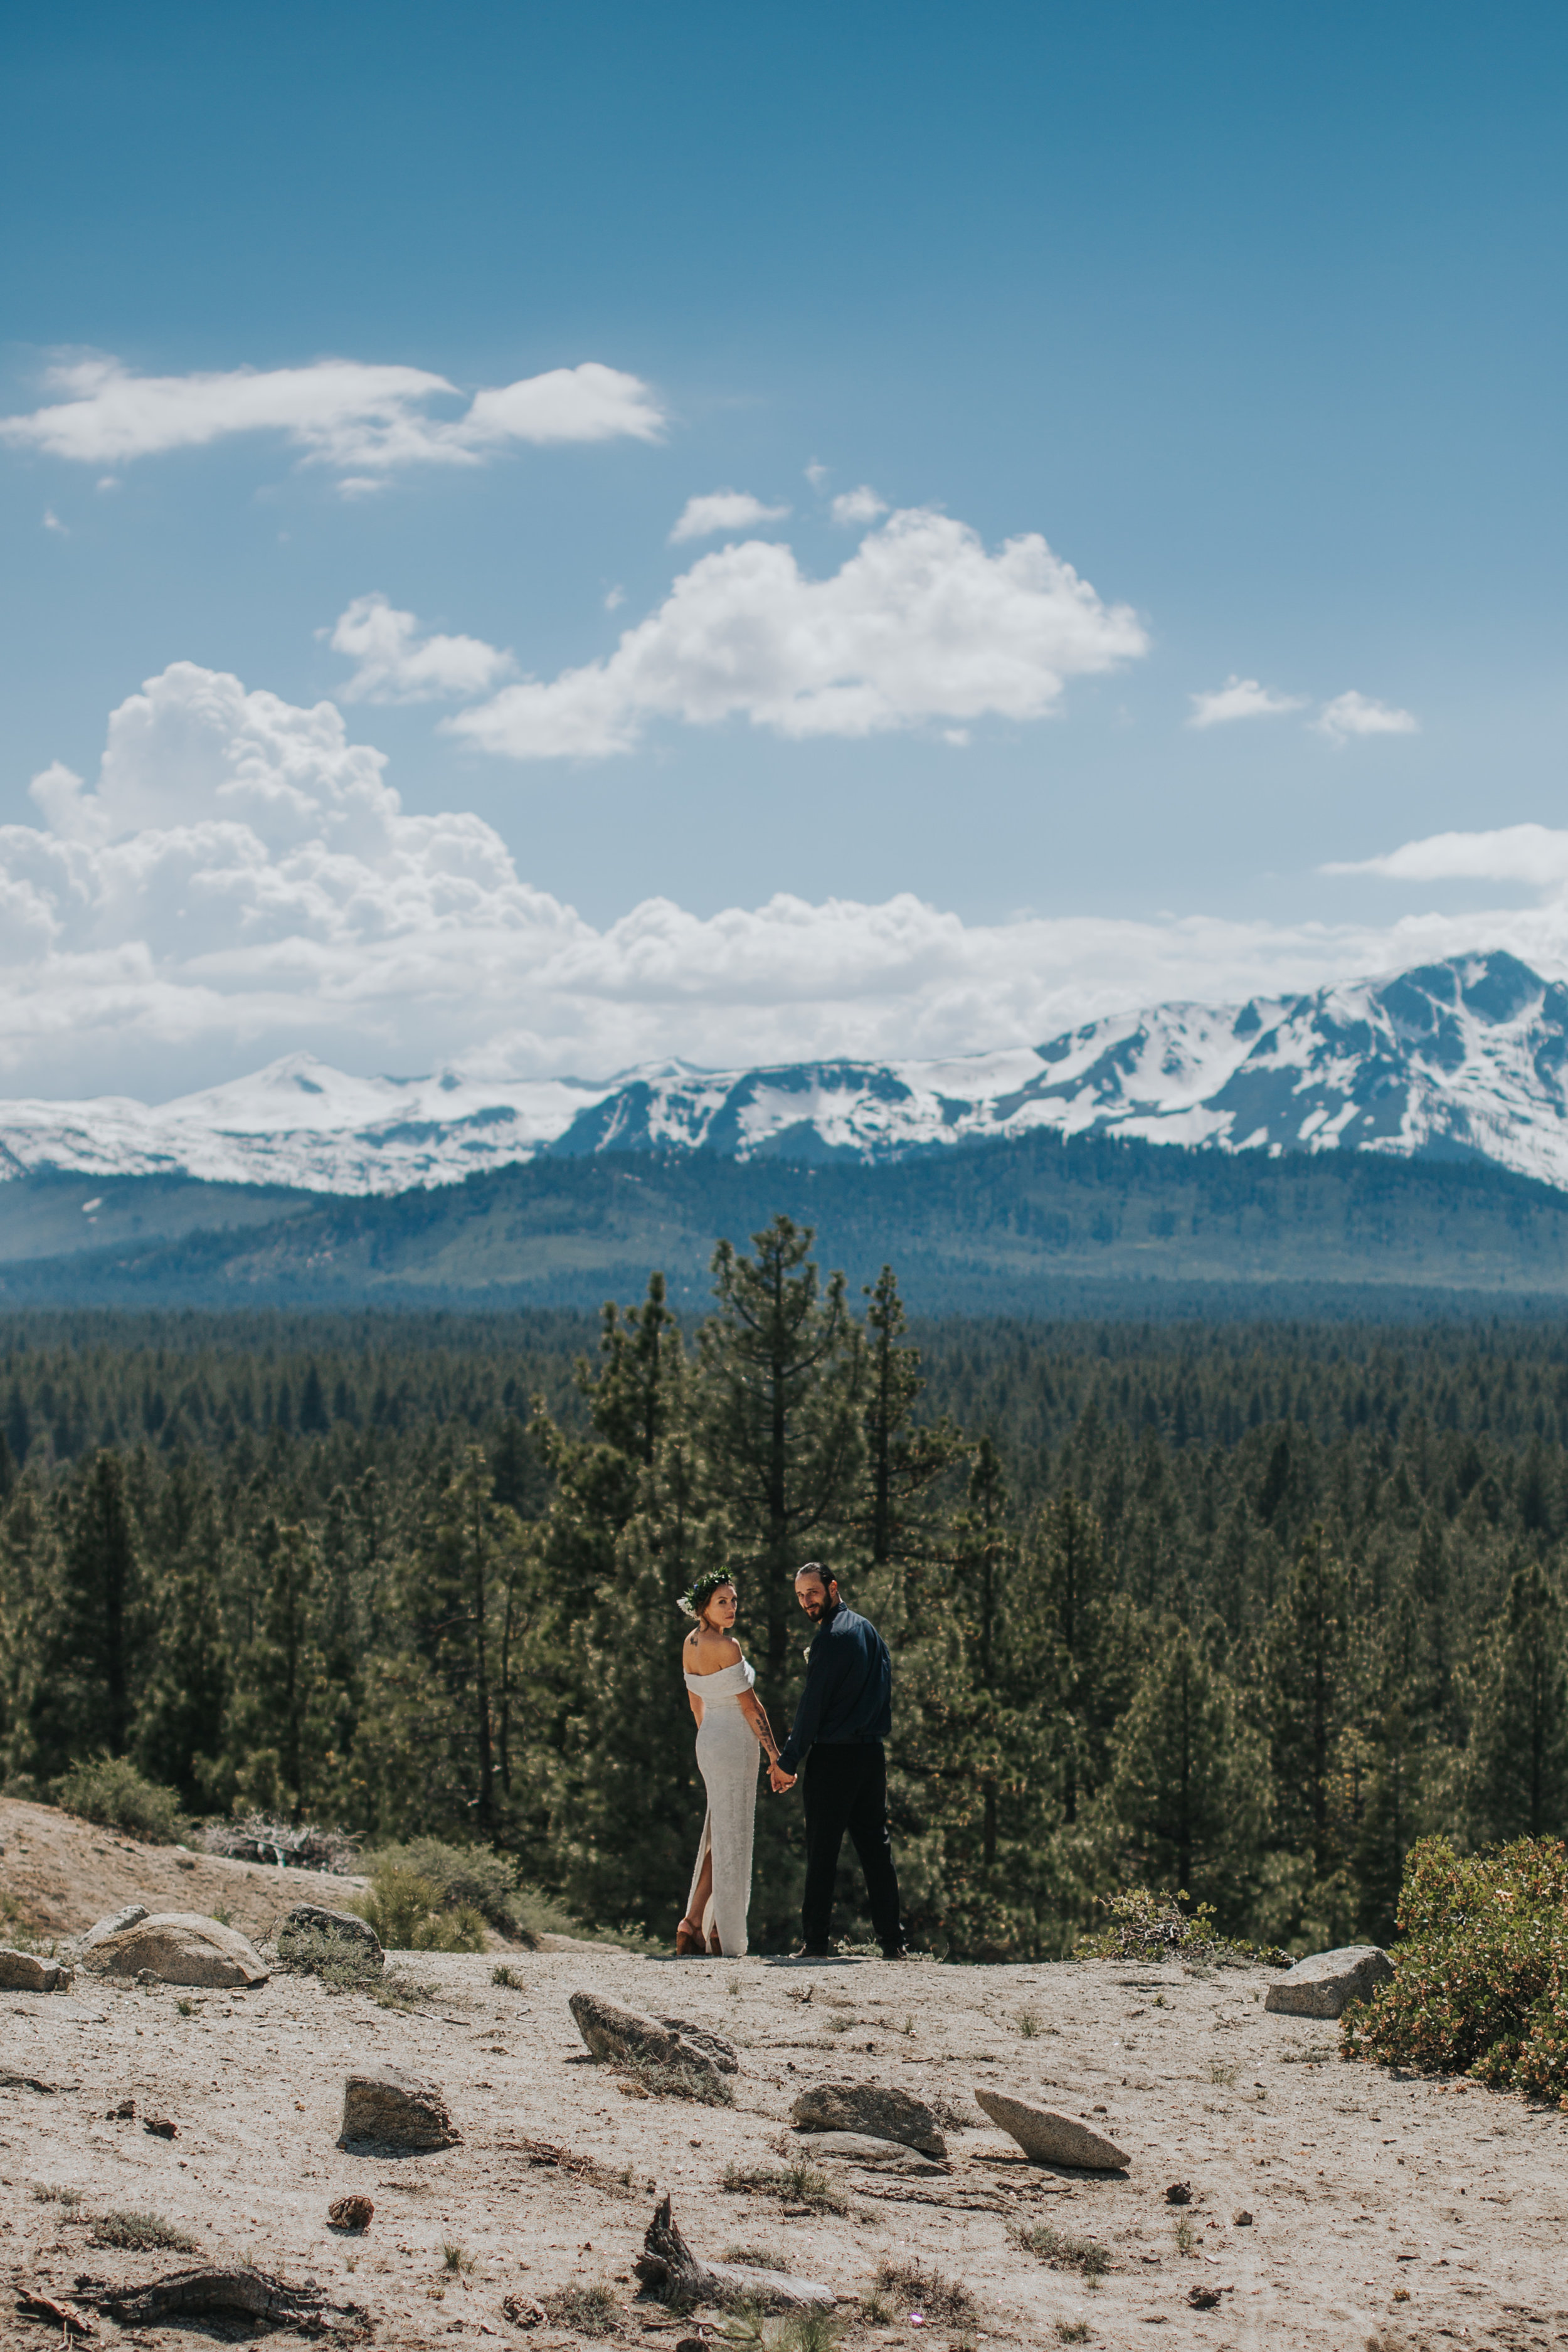 south-lake-tahoe-elopement-valerie-lendvay-photo-039.jpg